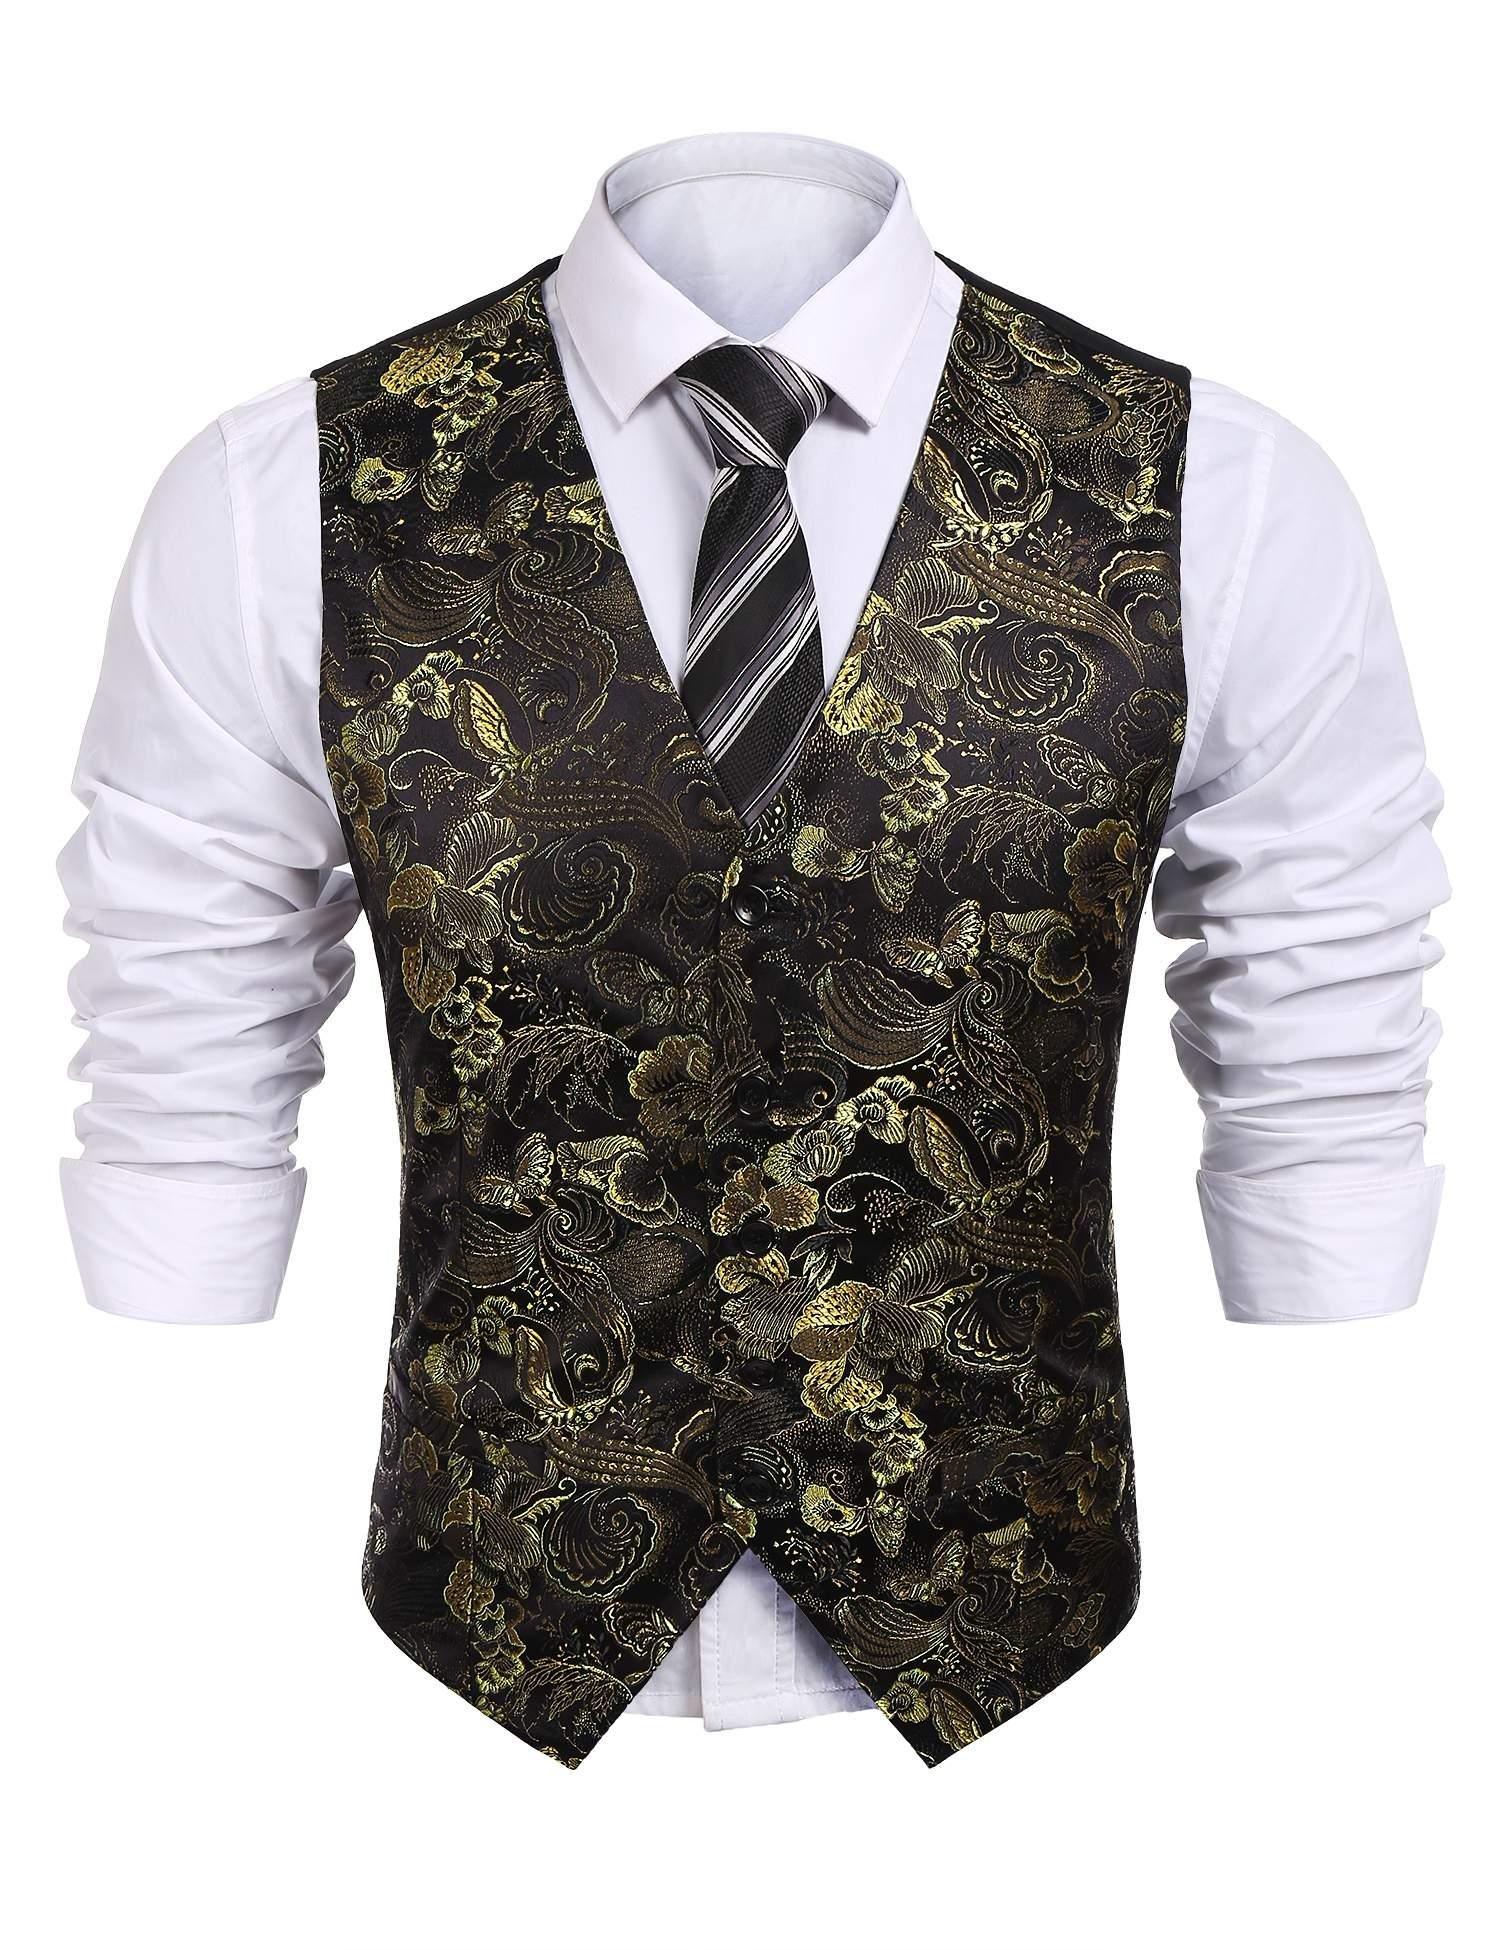 Dethler Mens 5-Buttons Formal Paisley Dress Vests For Sleek Looks On Formal Occasions